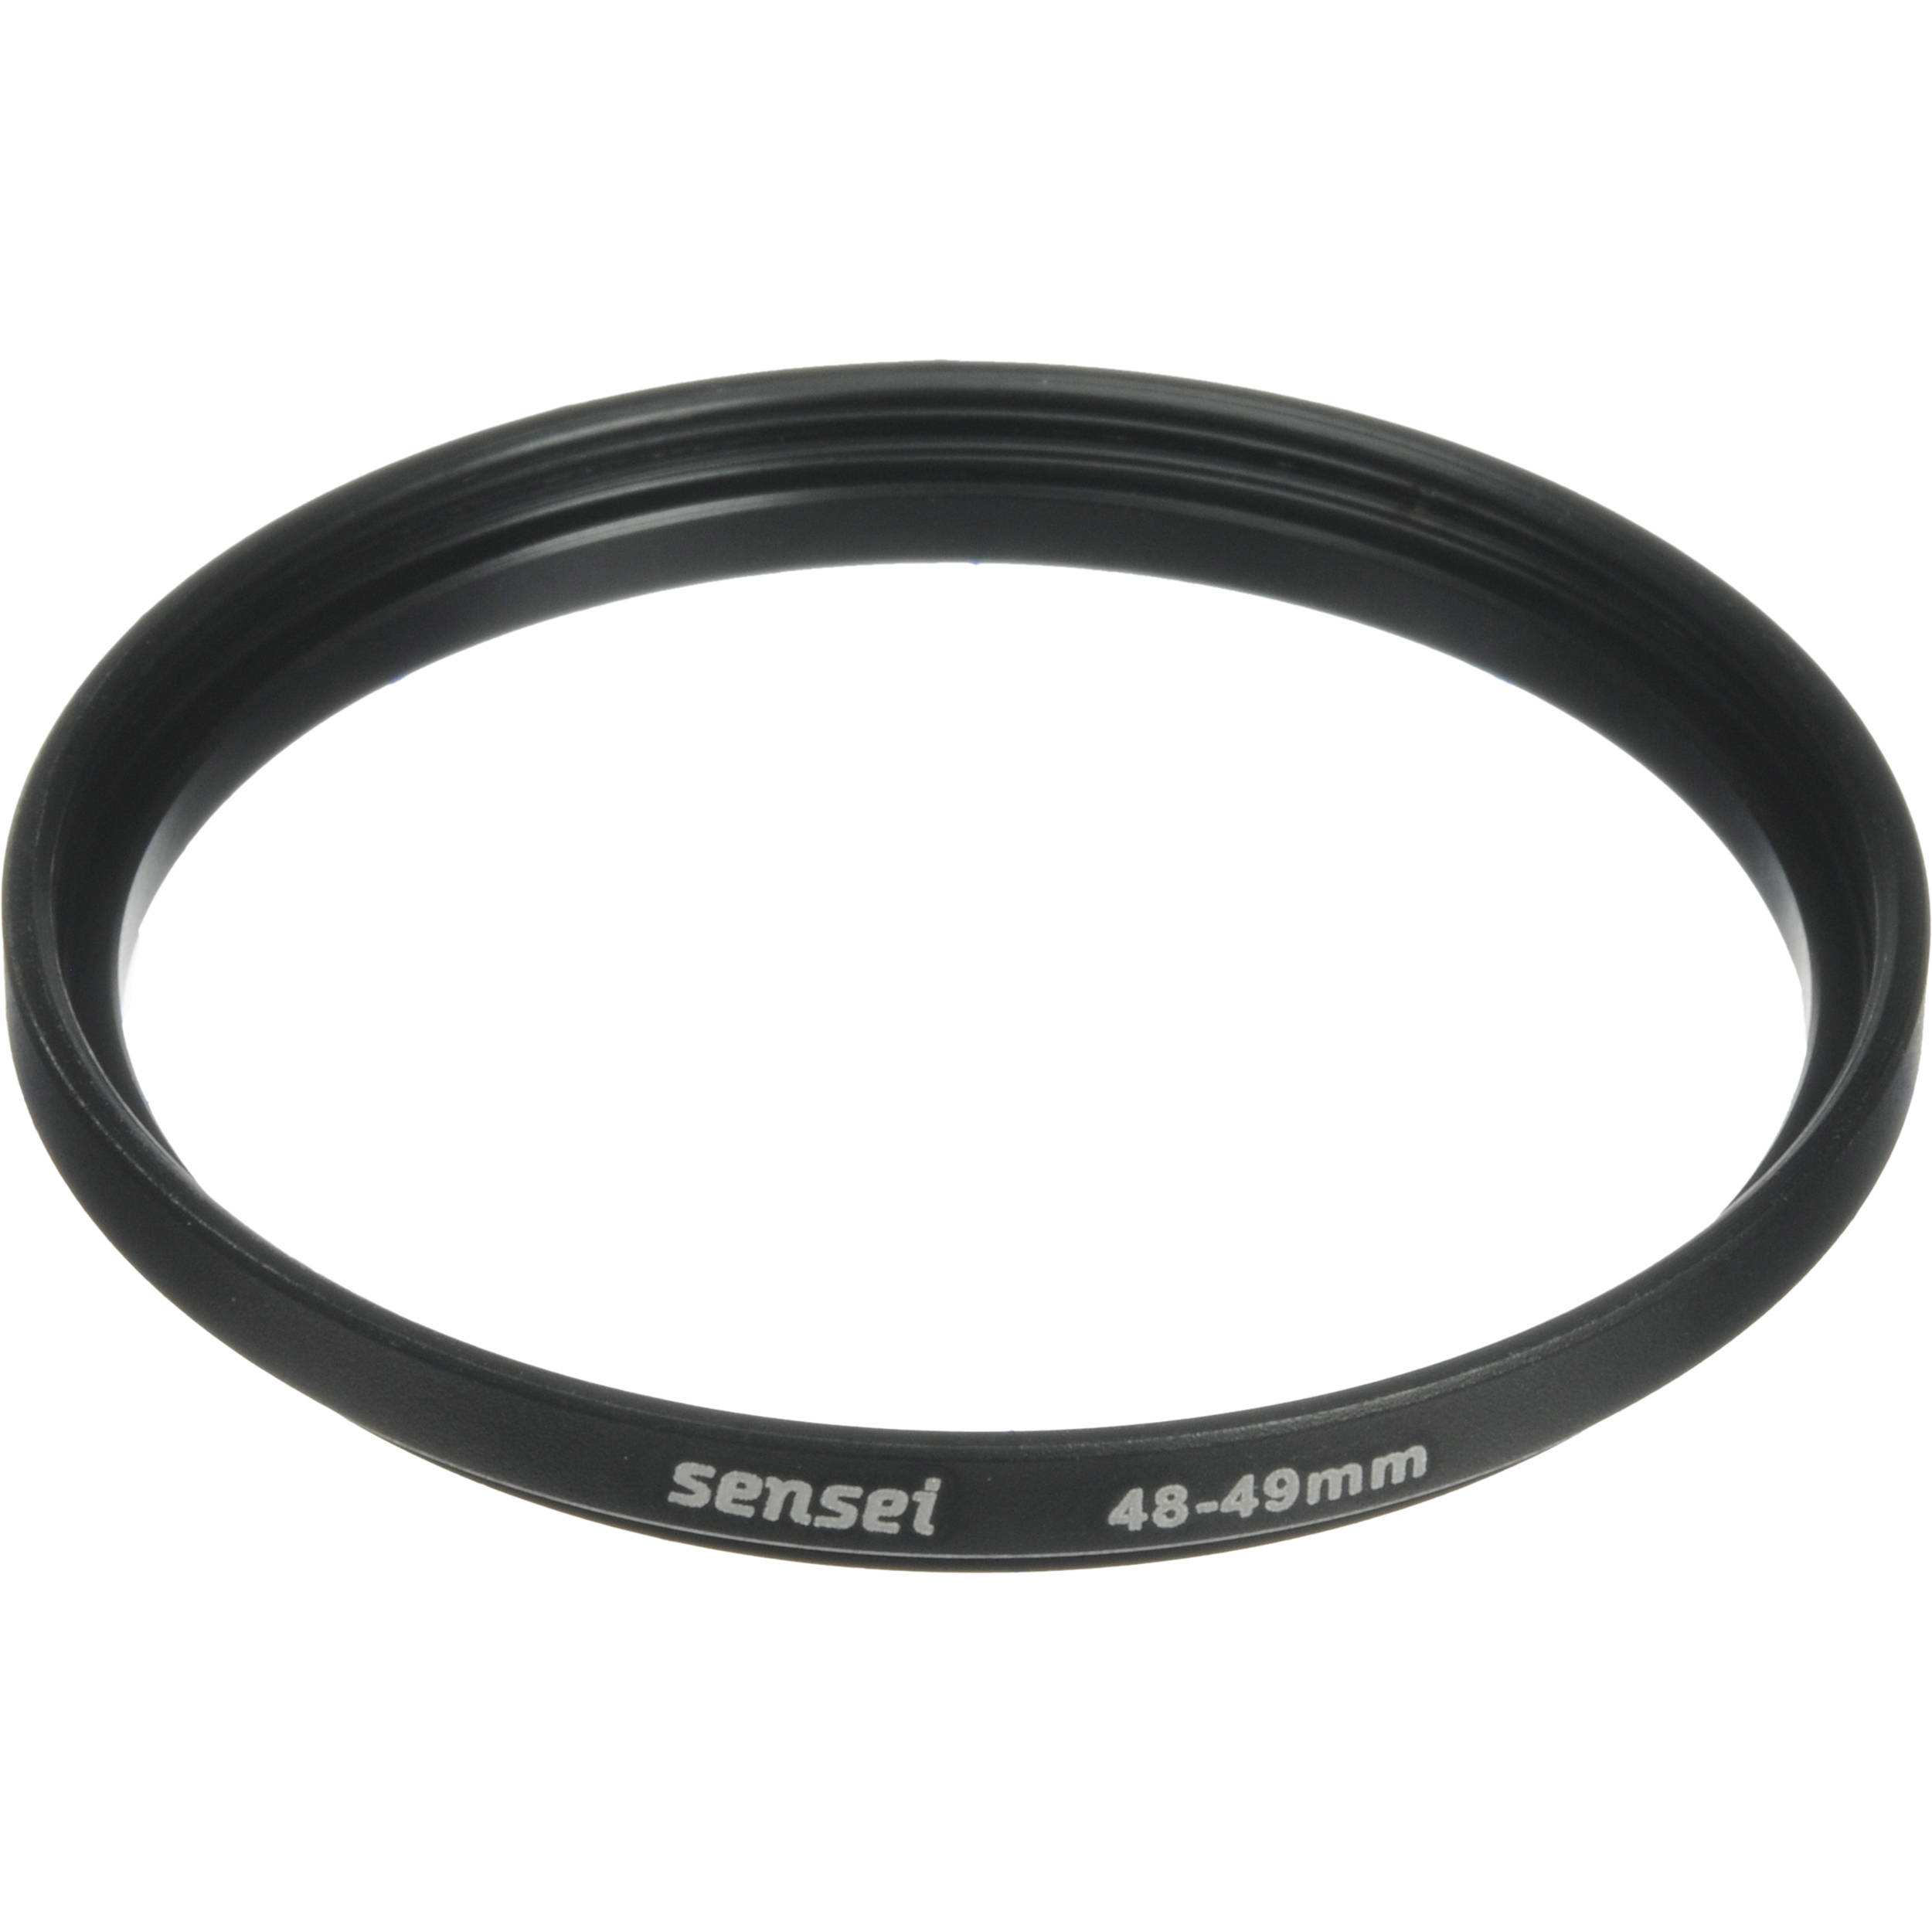 Sensei 49mm Lens to 43mm Filter Step-Down Ring 6 Pack